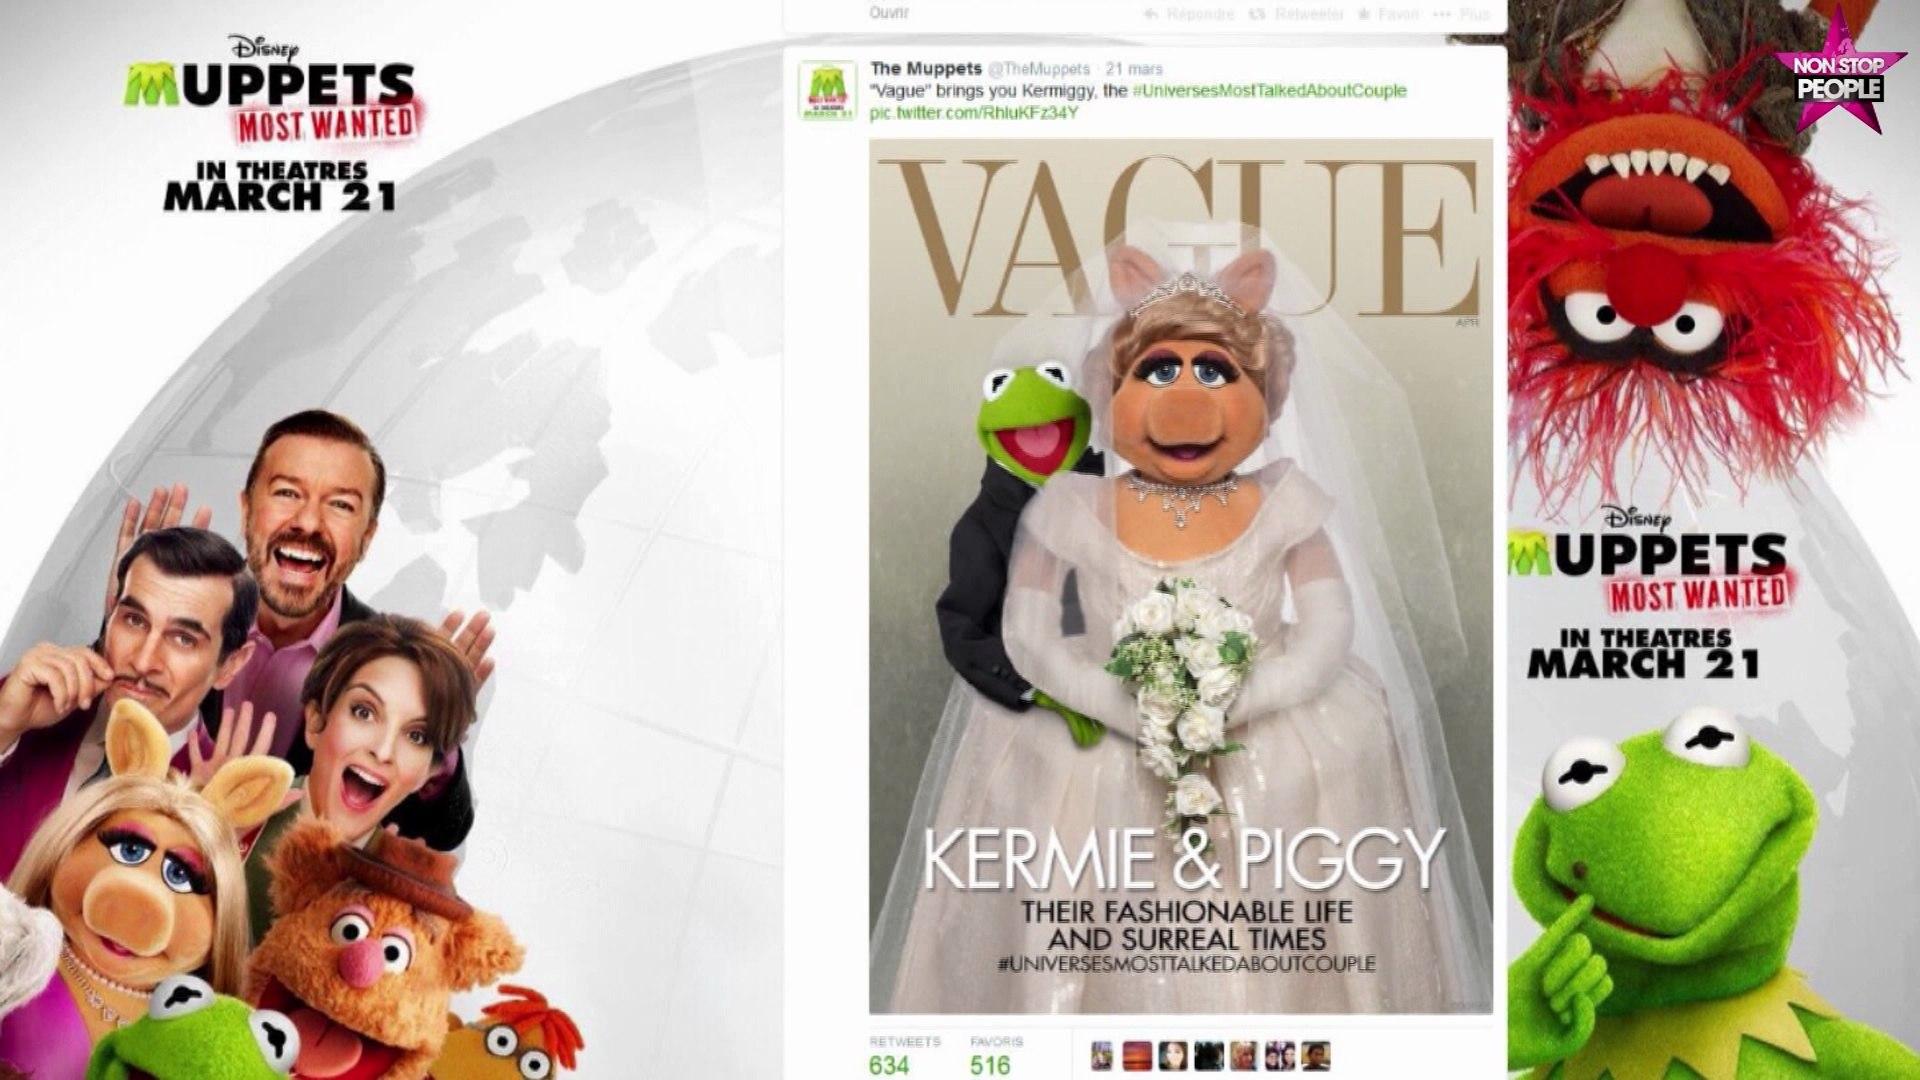 Kim Kardashian et Kanye West dans vogue parodiés